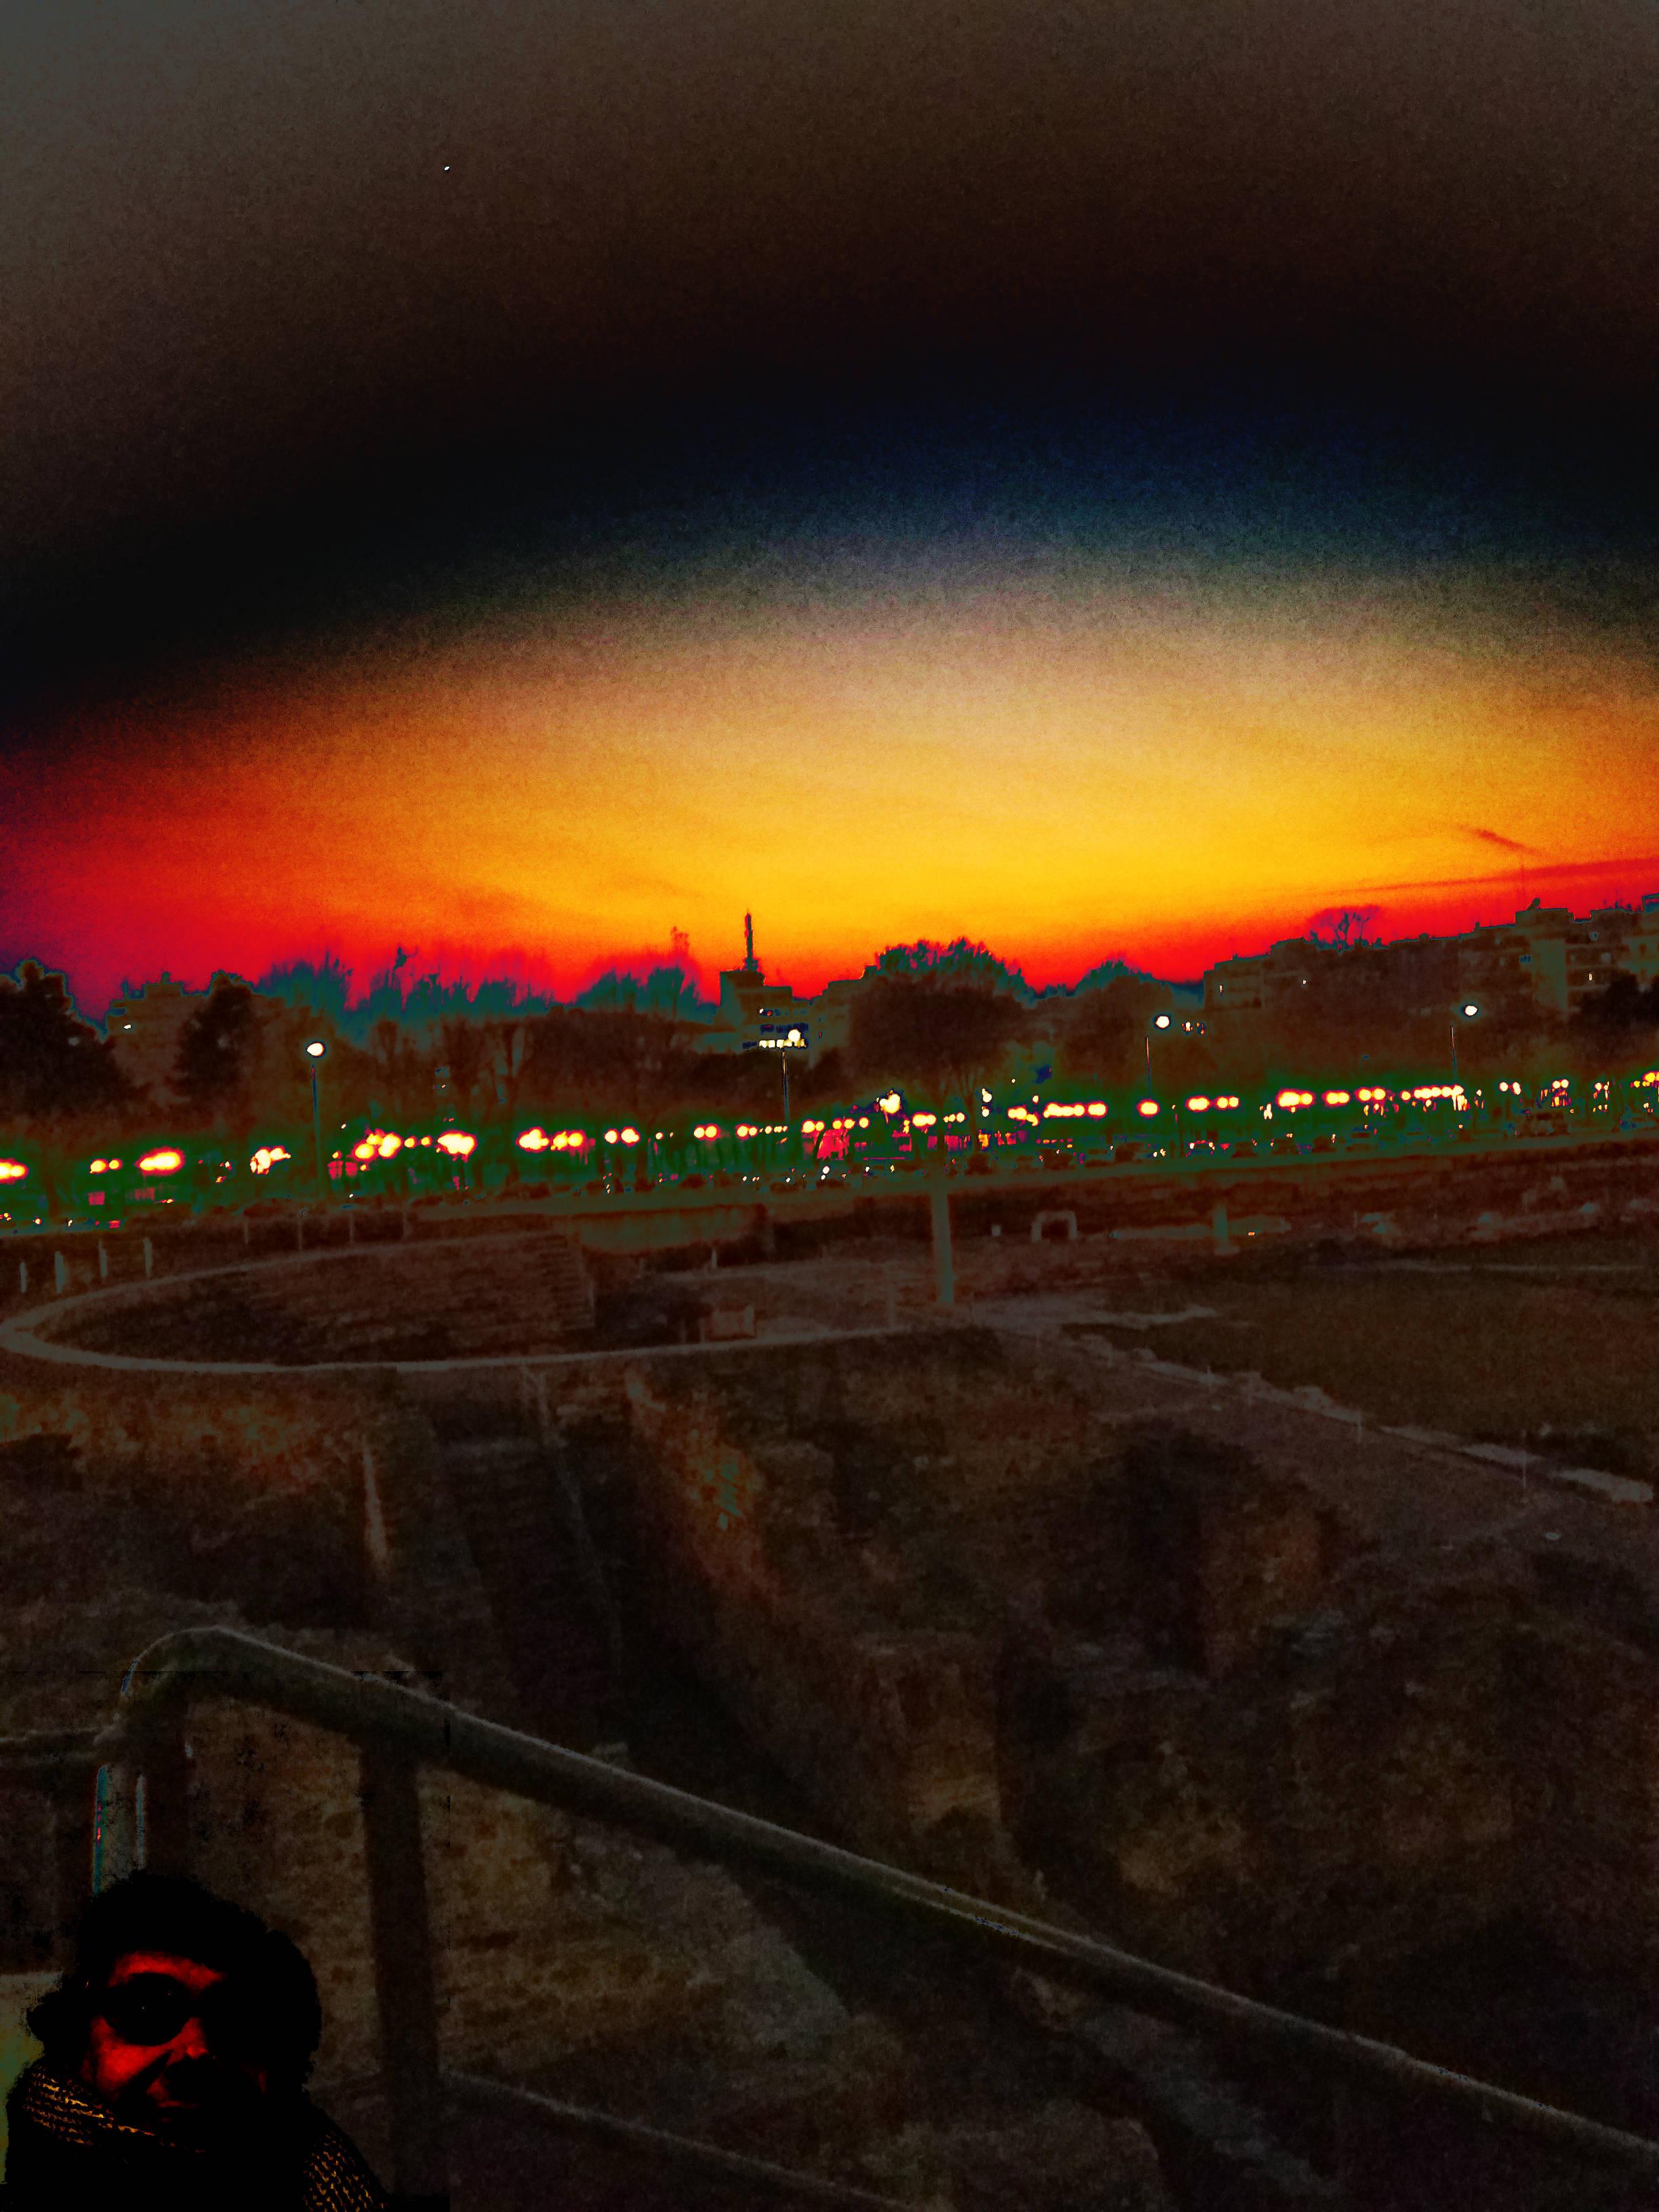 Trip The Light Pretentious - Jay Leonard Schwartz